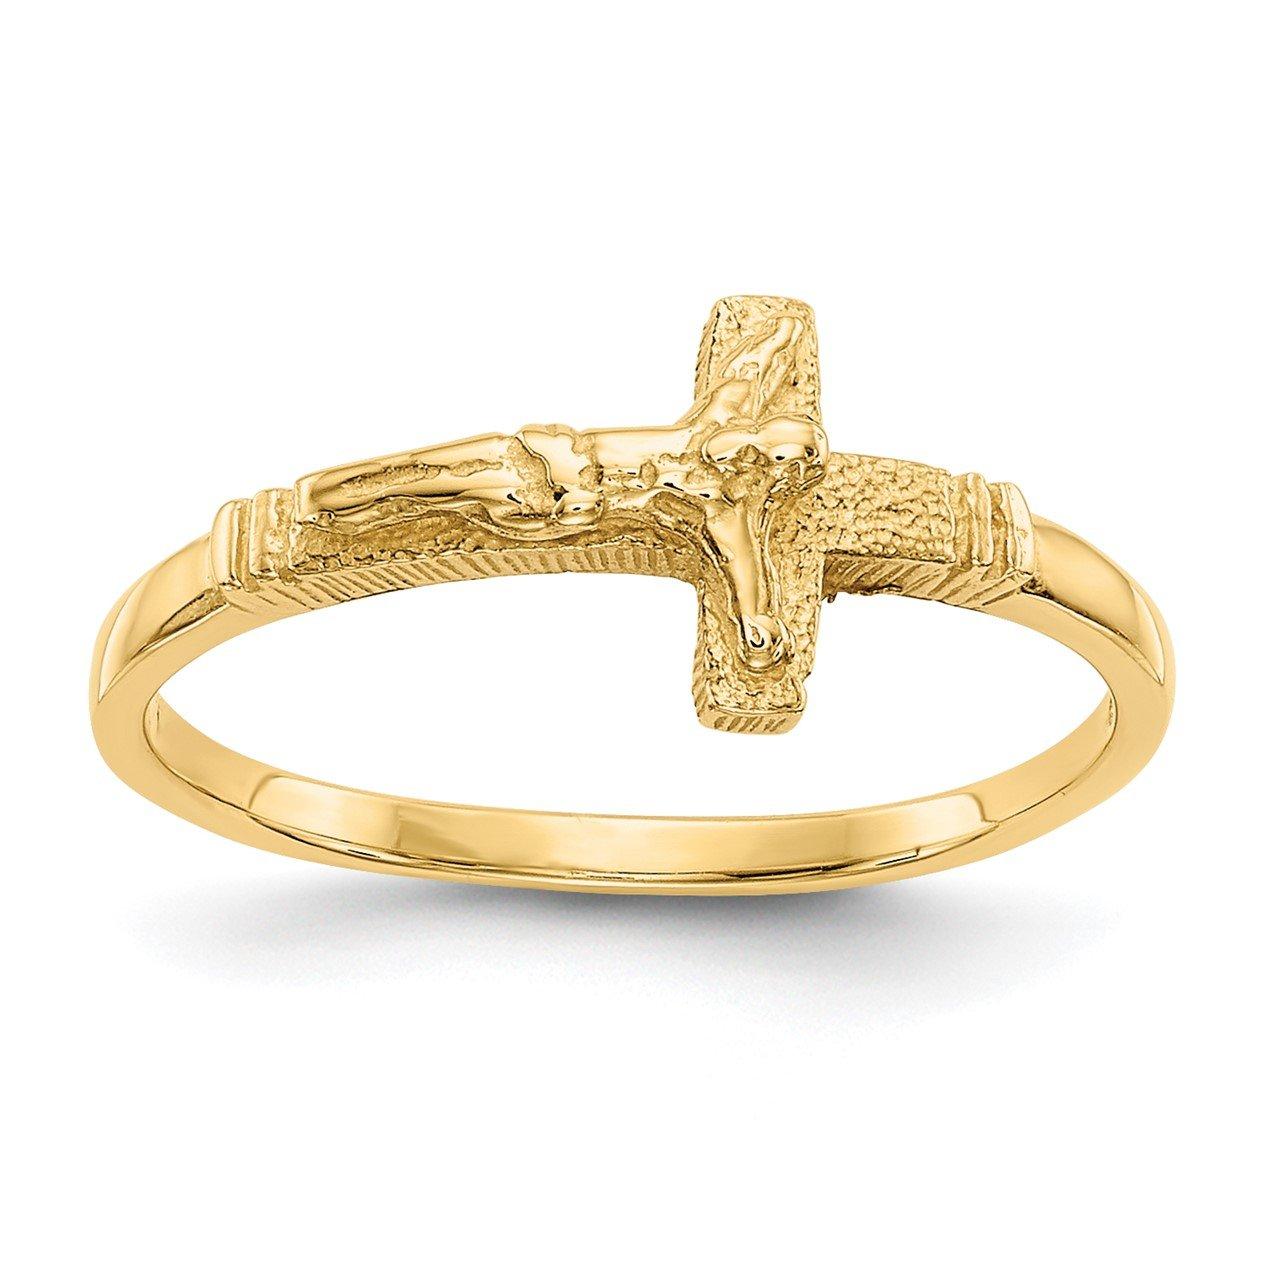 14K Satin Finish Childs Crucifix Ring